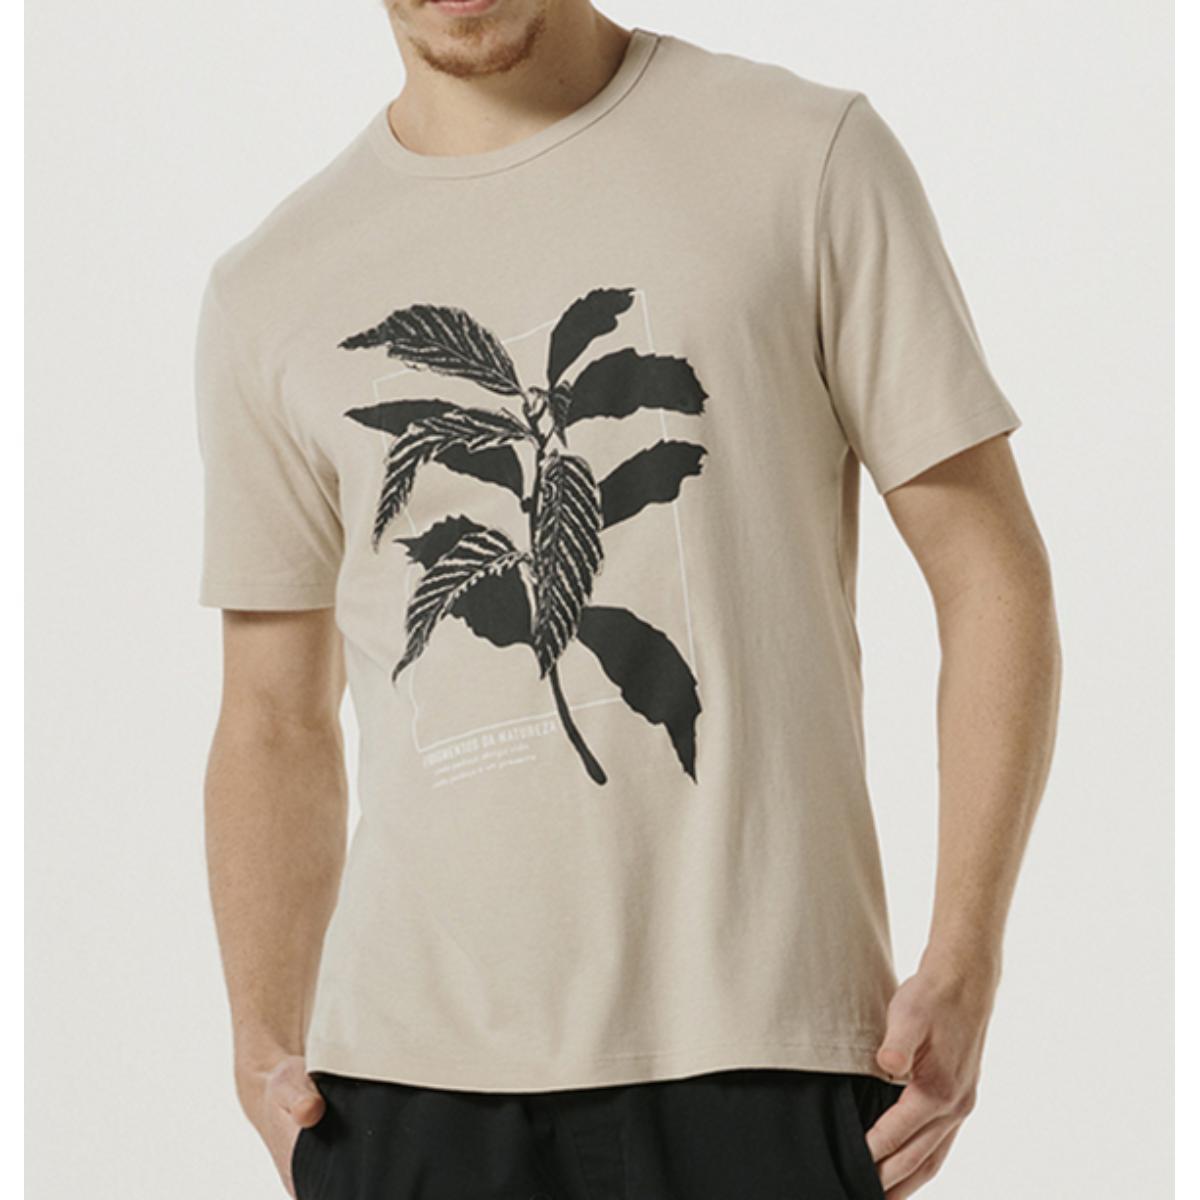 Camiseta Masculina Hering 4fa3 Hjmen Bege